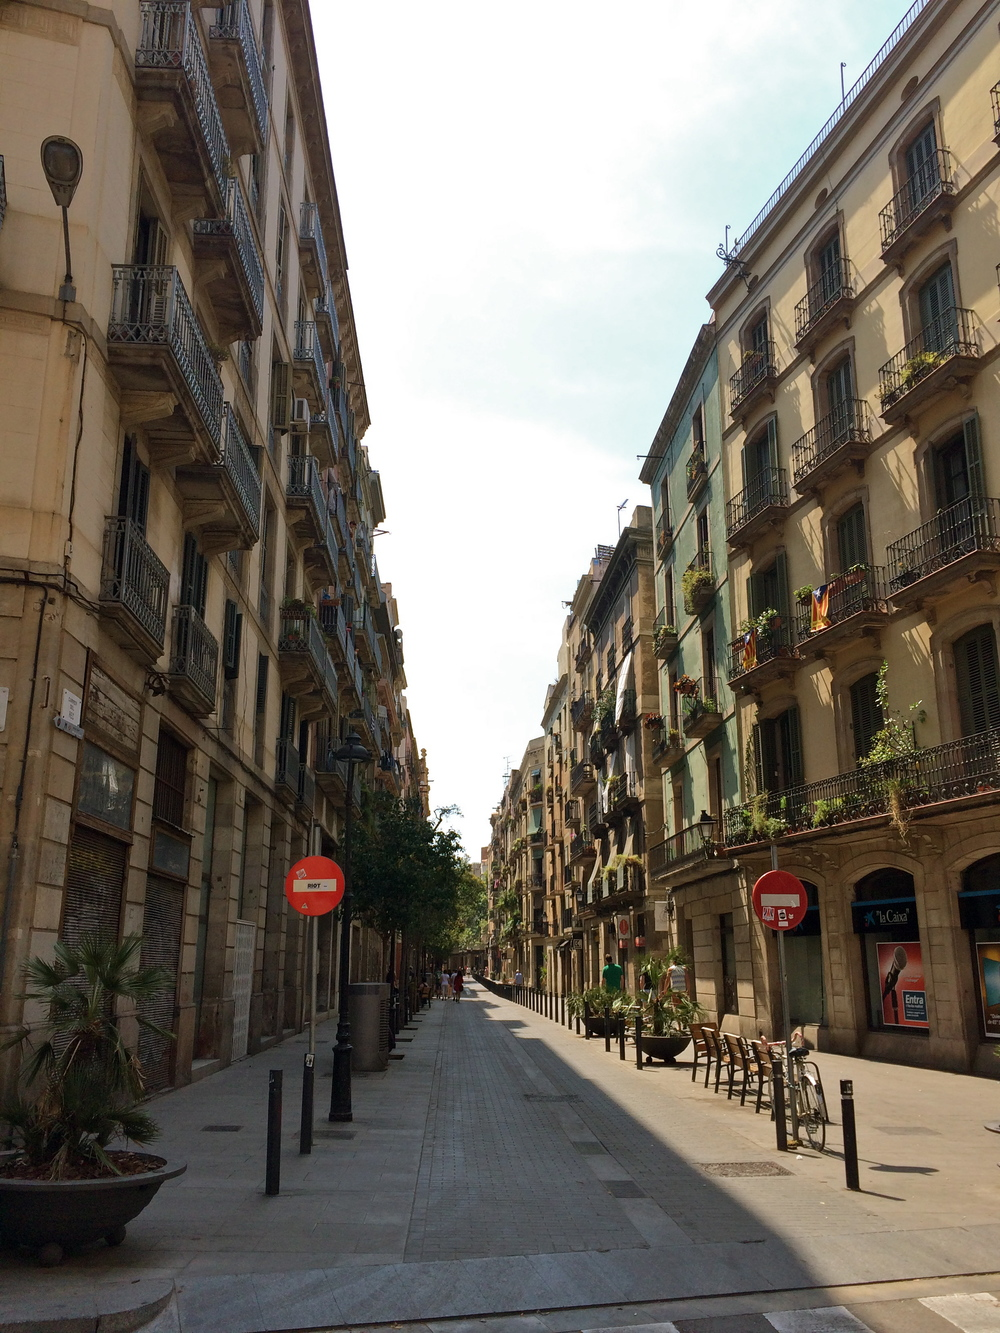 ◆ Barcelona streets